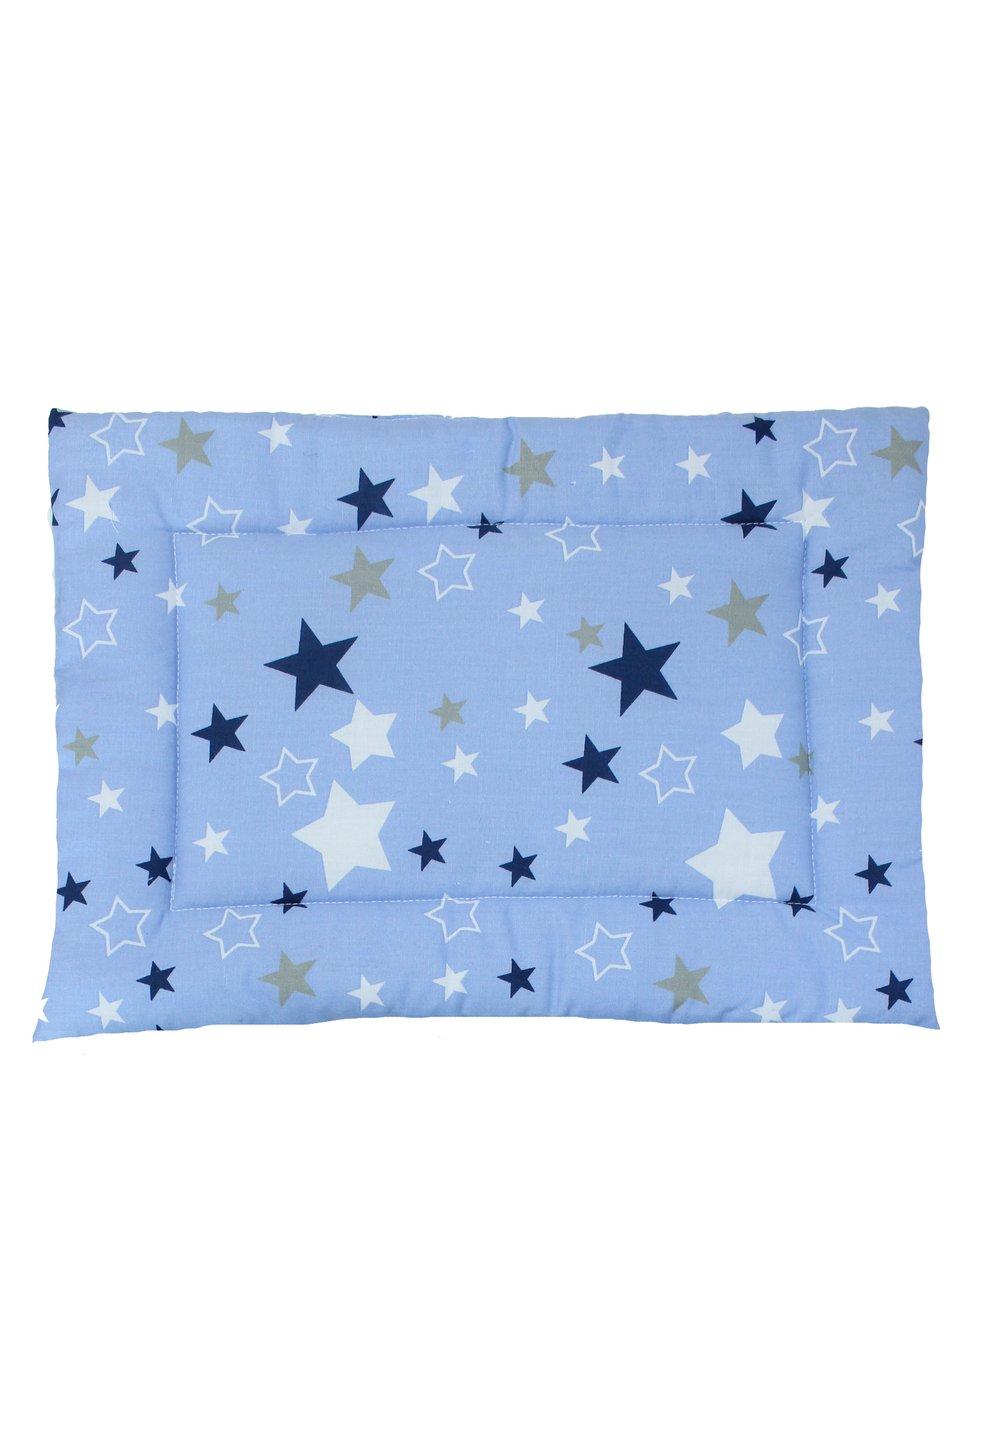 Perna slim, albastra cu stelute, 37x28cm imagine